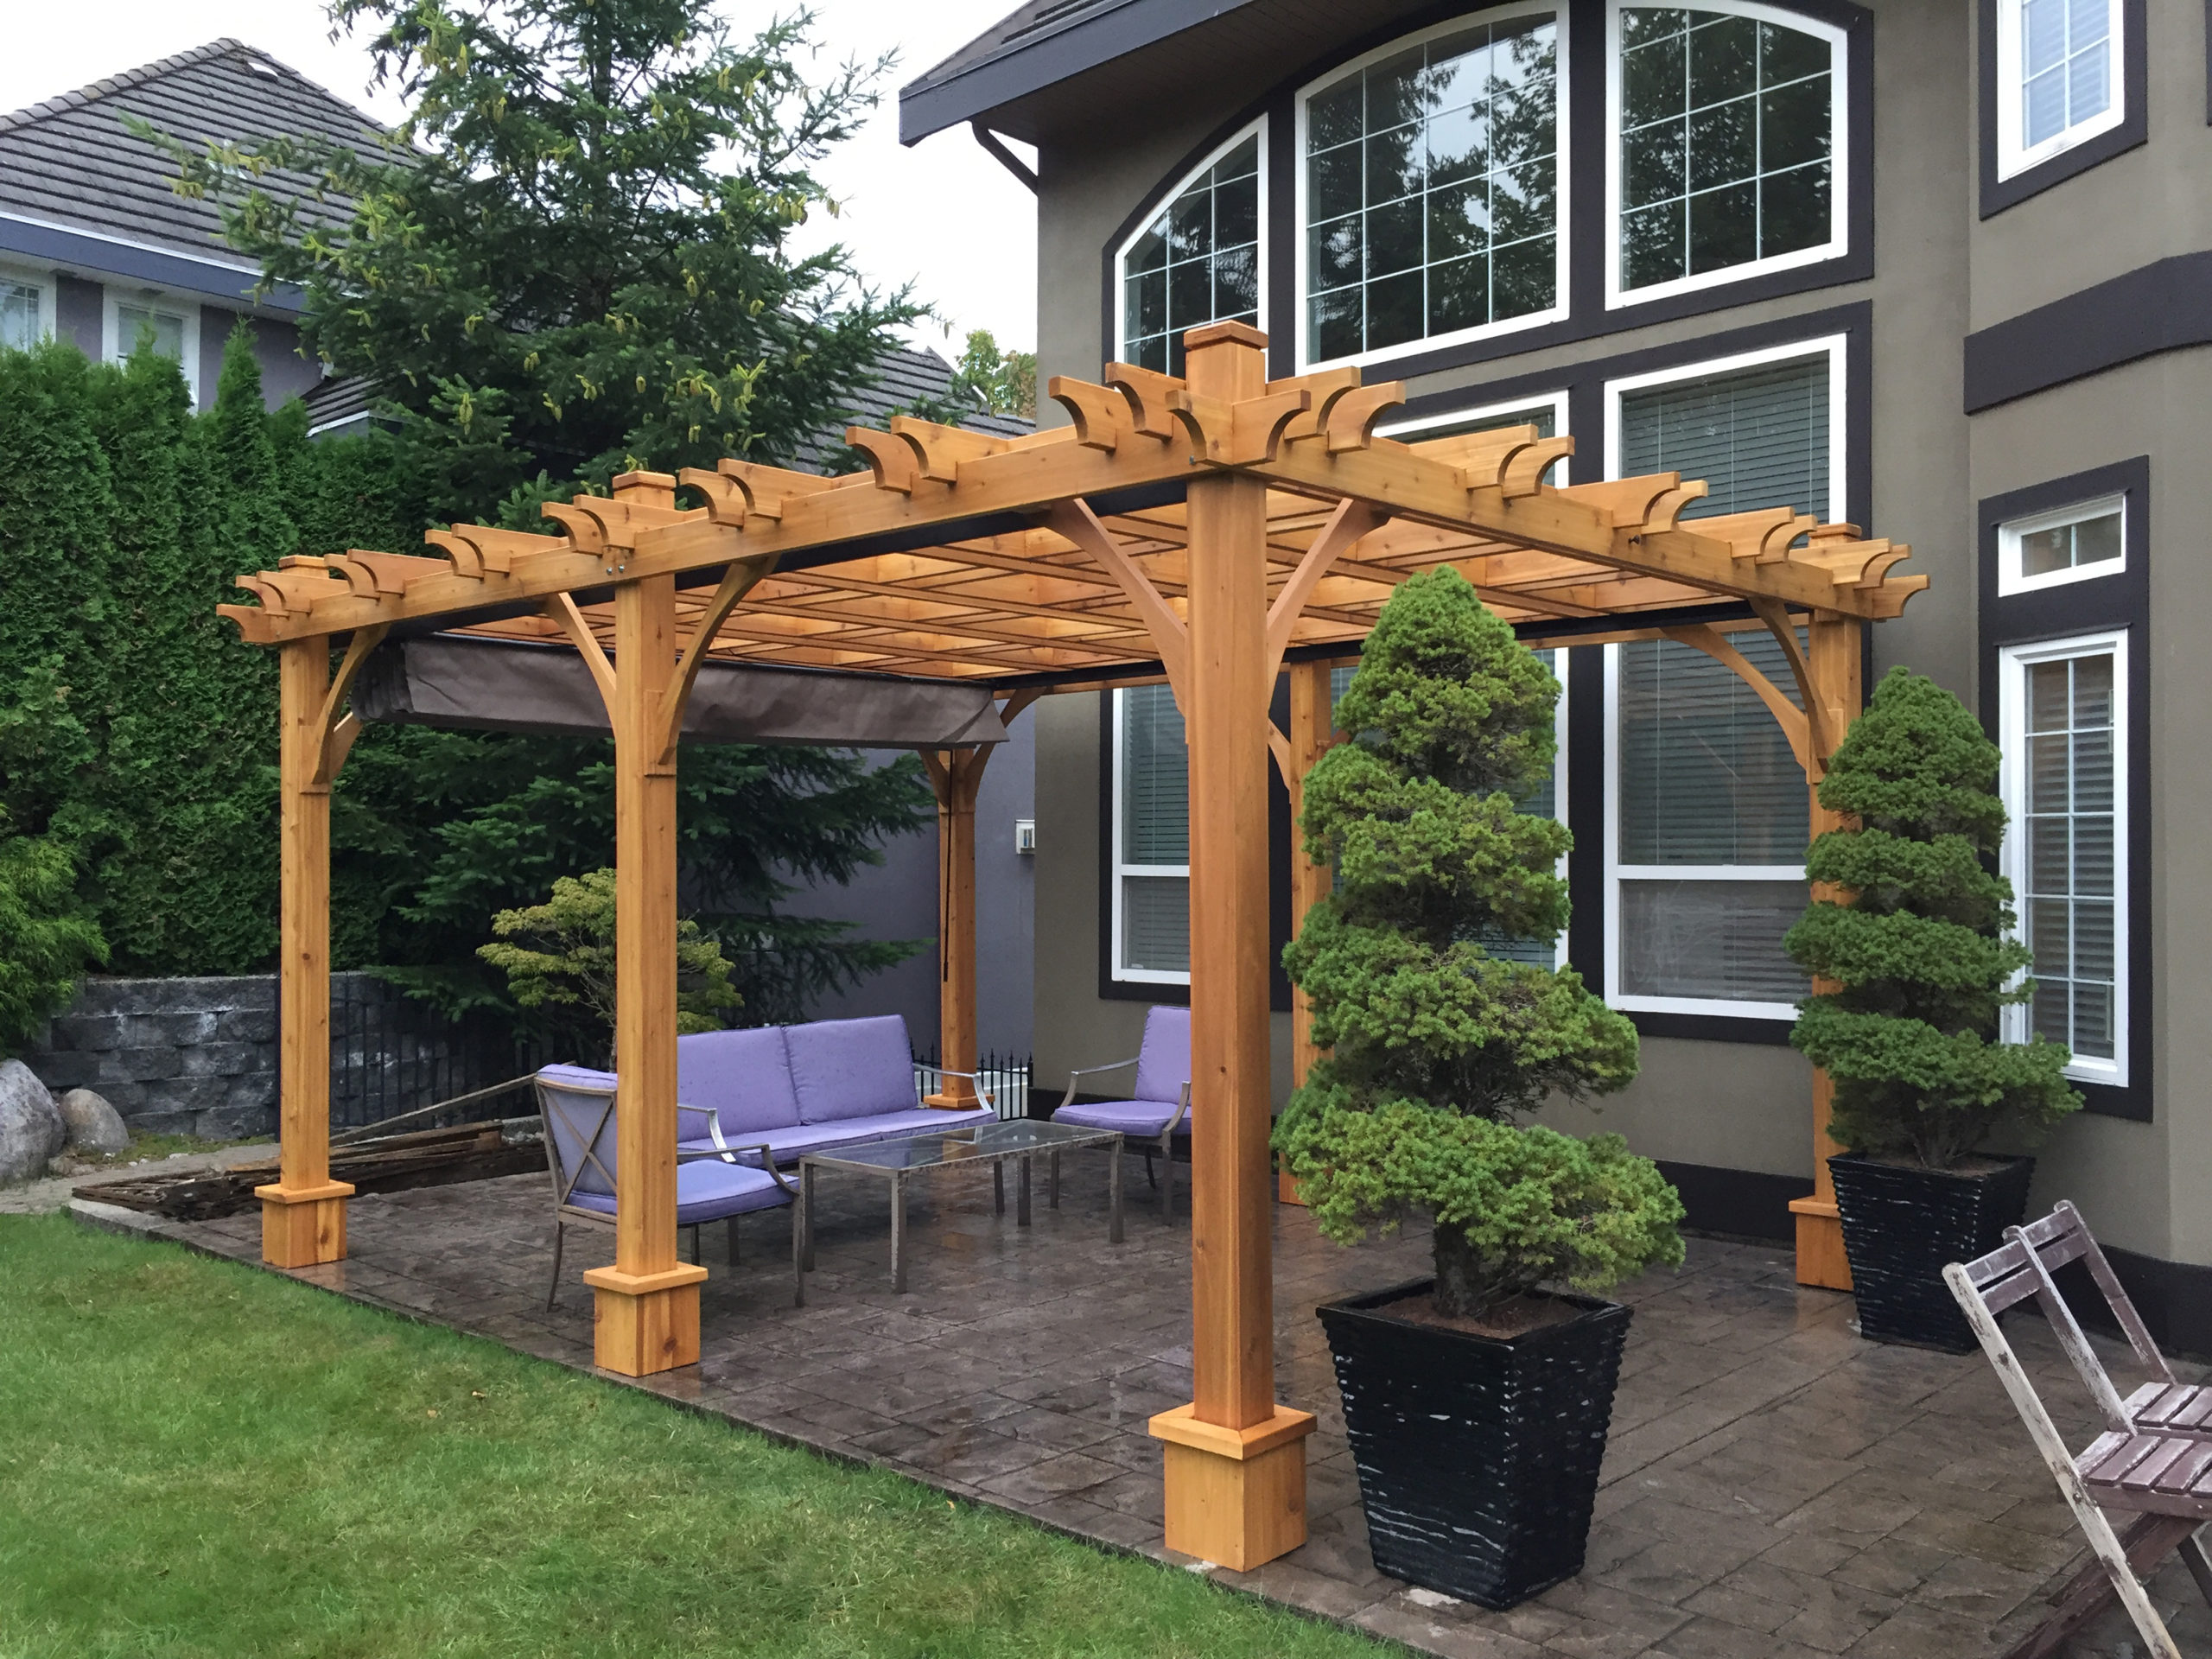 Pergola with Retractable Canopy | 10x16 - OLT